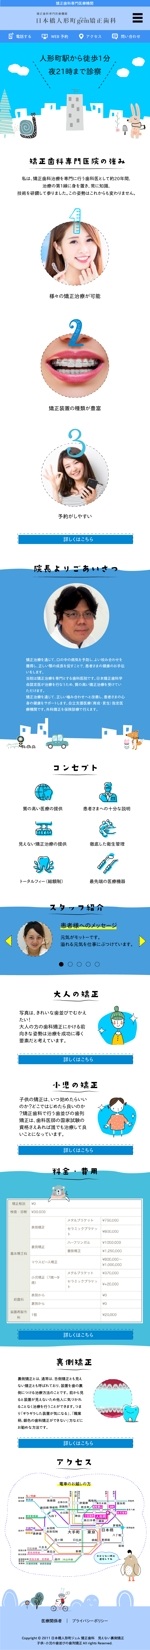 n_kawaeさんの見やすいのwebデザイン 矯正歯科レスポンシブxワードプレスへの提案